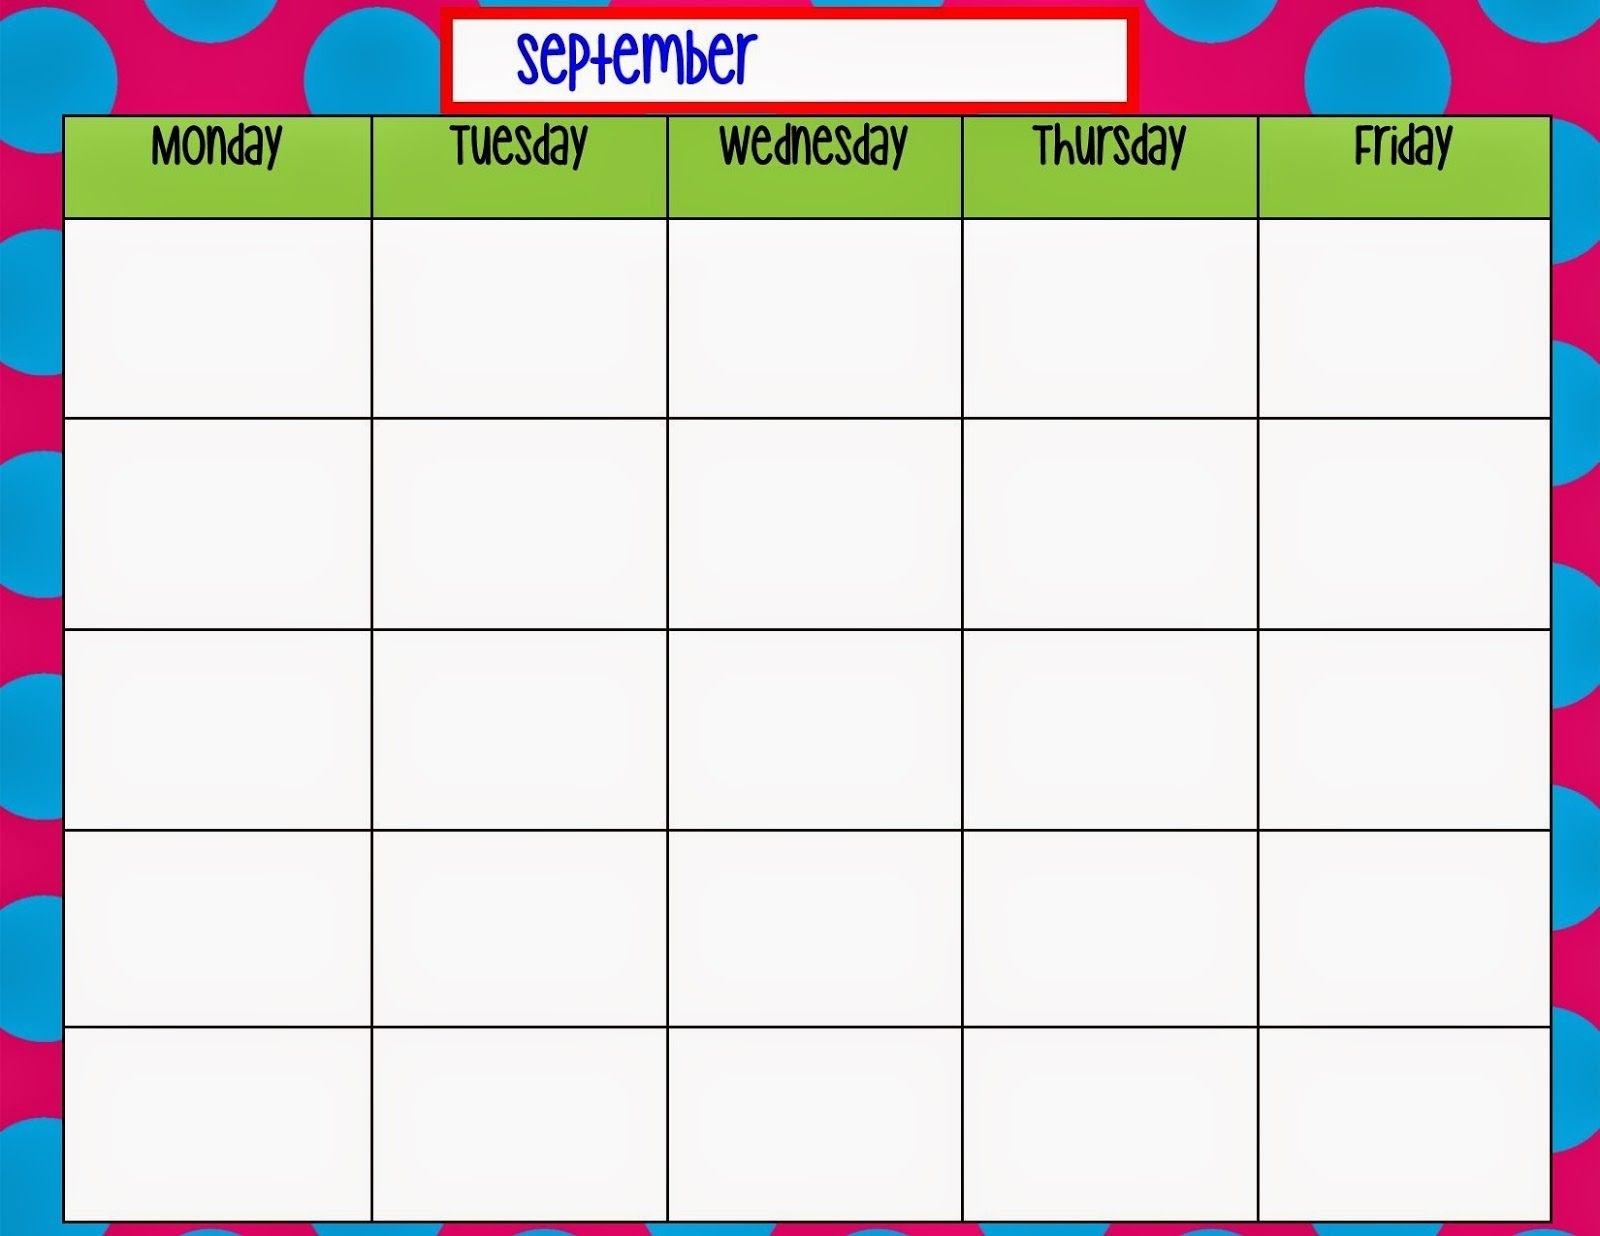 Free Calendars Monday To Sunday - Calendar Inspiration Design  Monday Through Friday Schedule